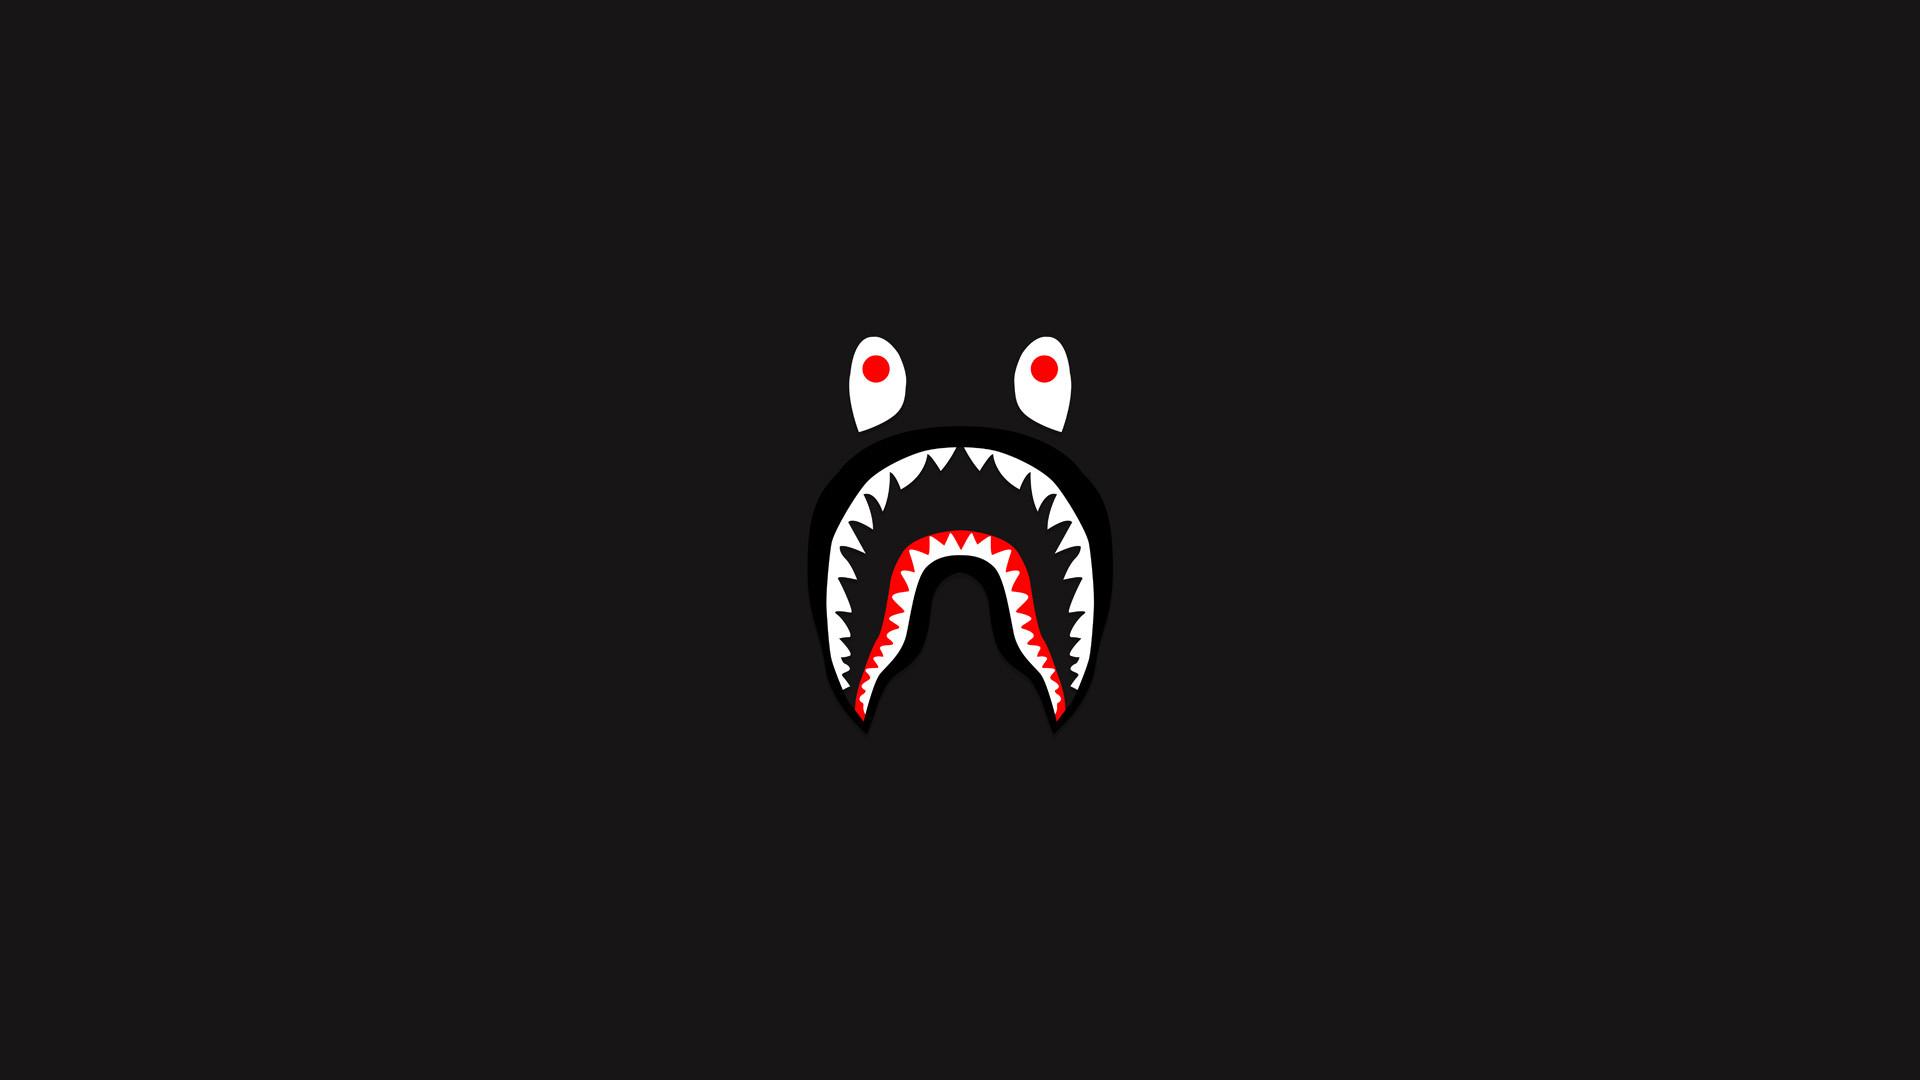 Bape Shark Wallpaper 49 images